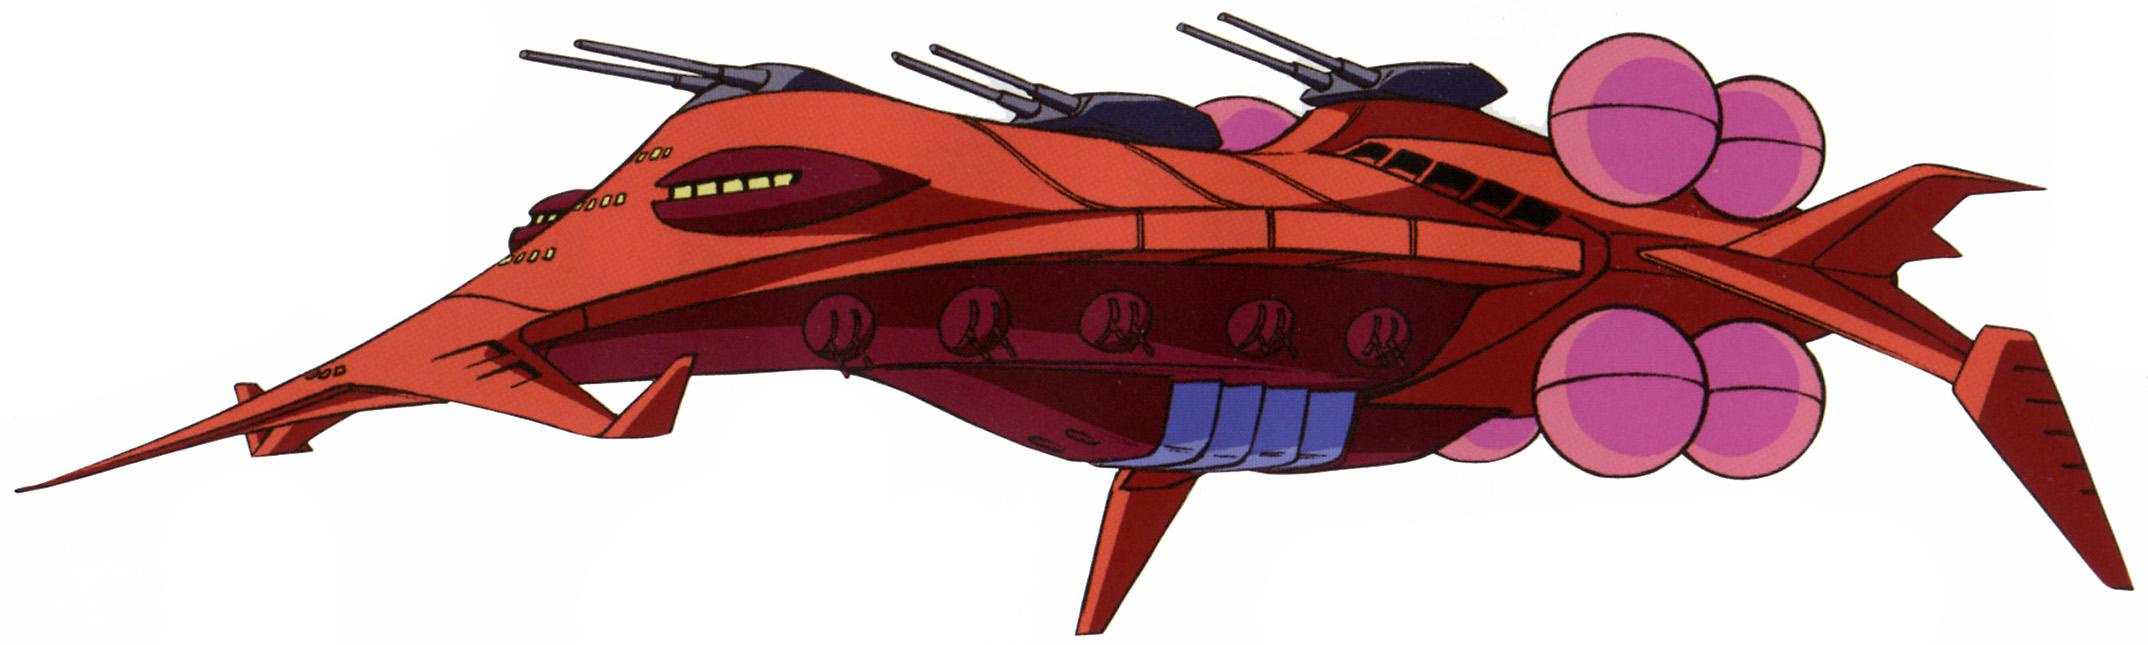 File:Gwazine class battleship (gundam).jpg